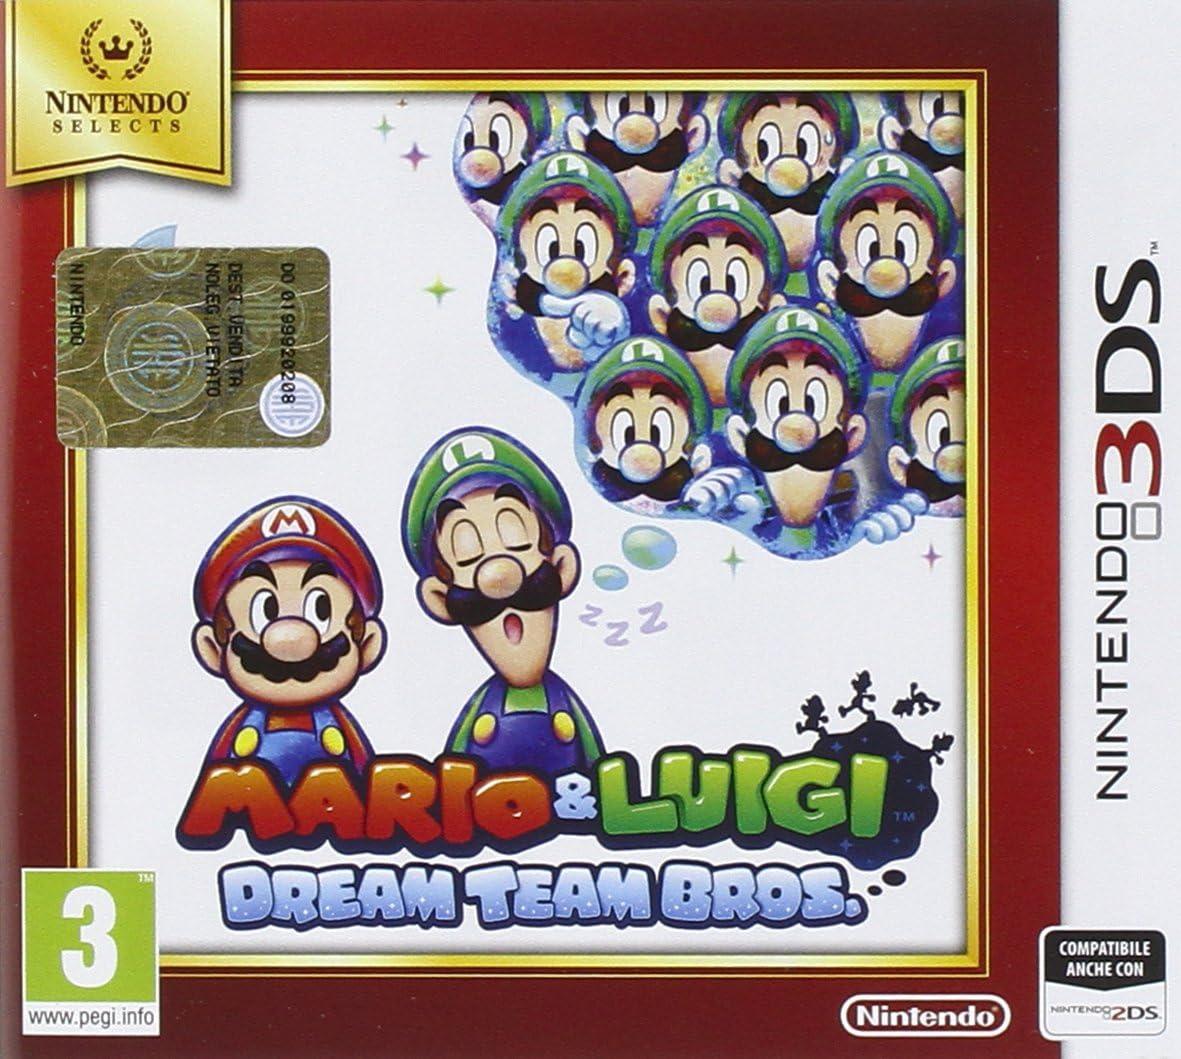 Mario & Luigi: Dream Team Bros - Nintendo Selects [Importación Italiana]